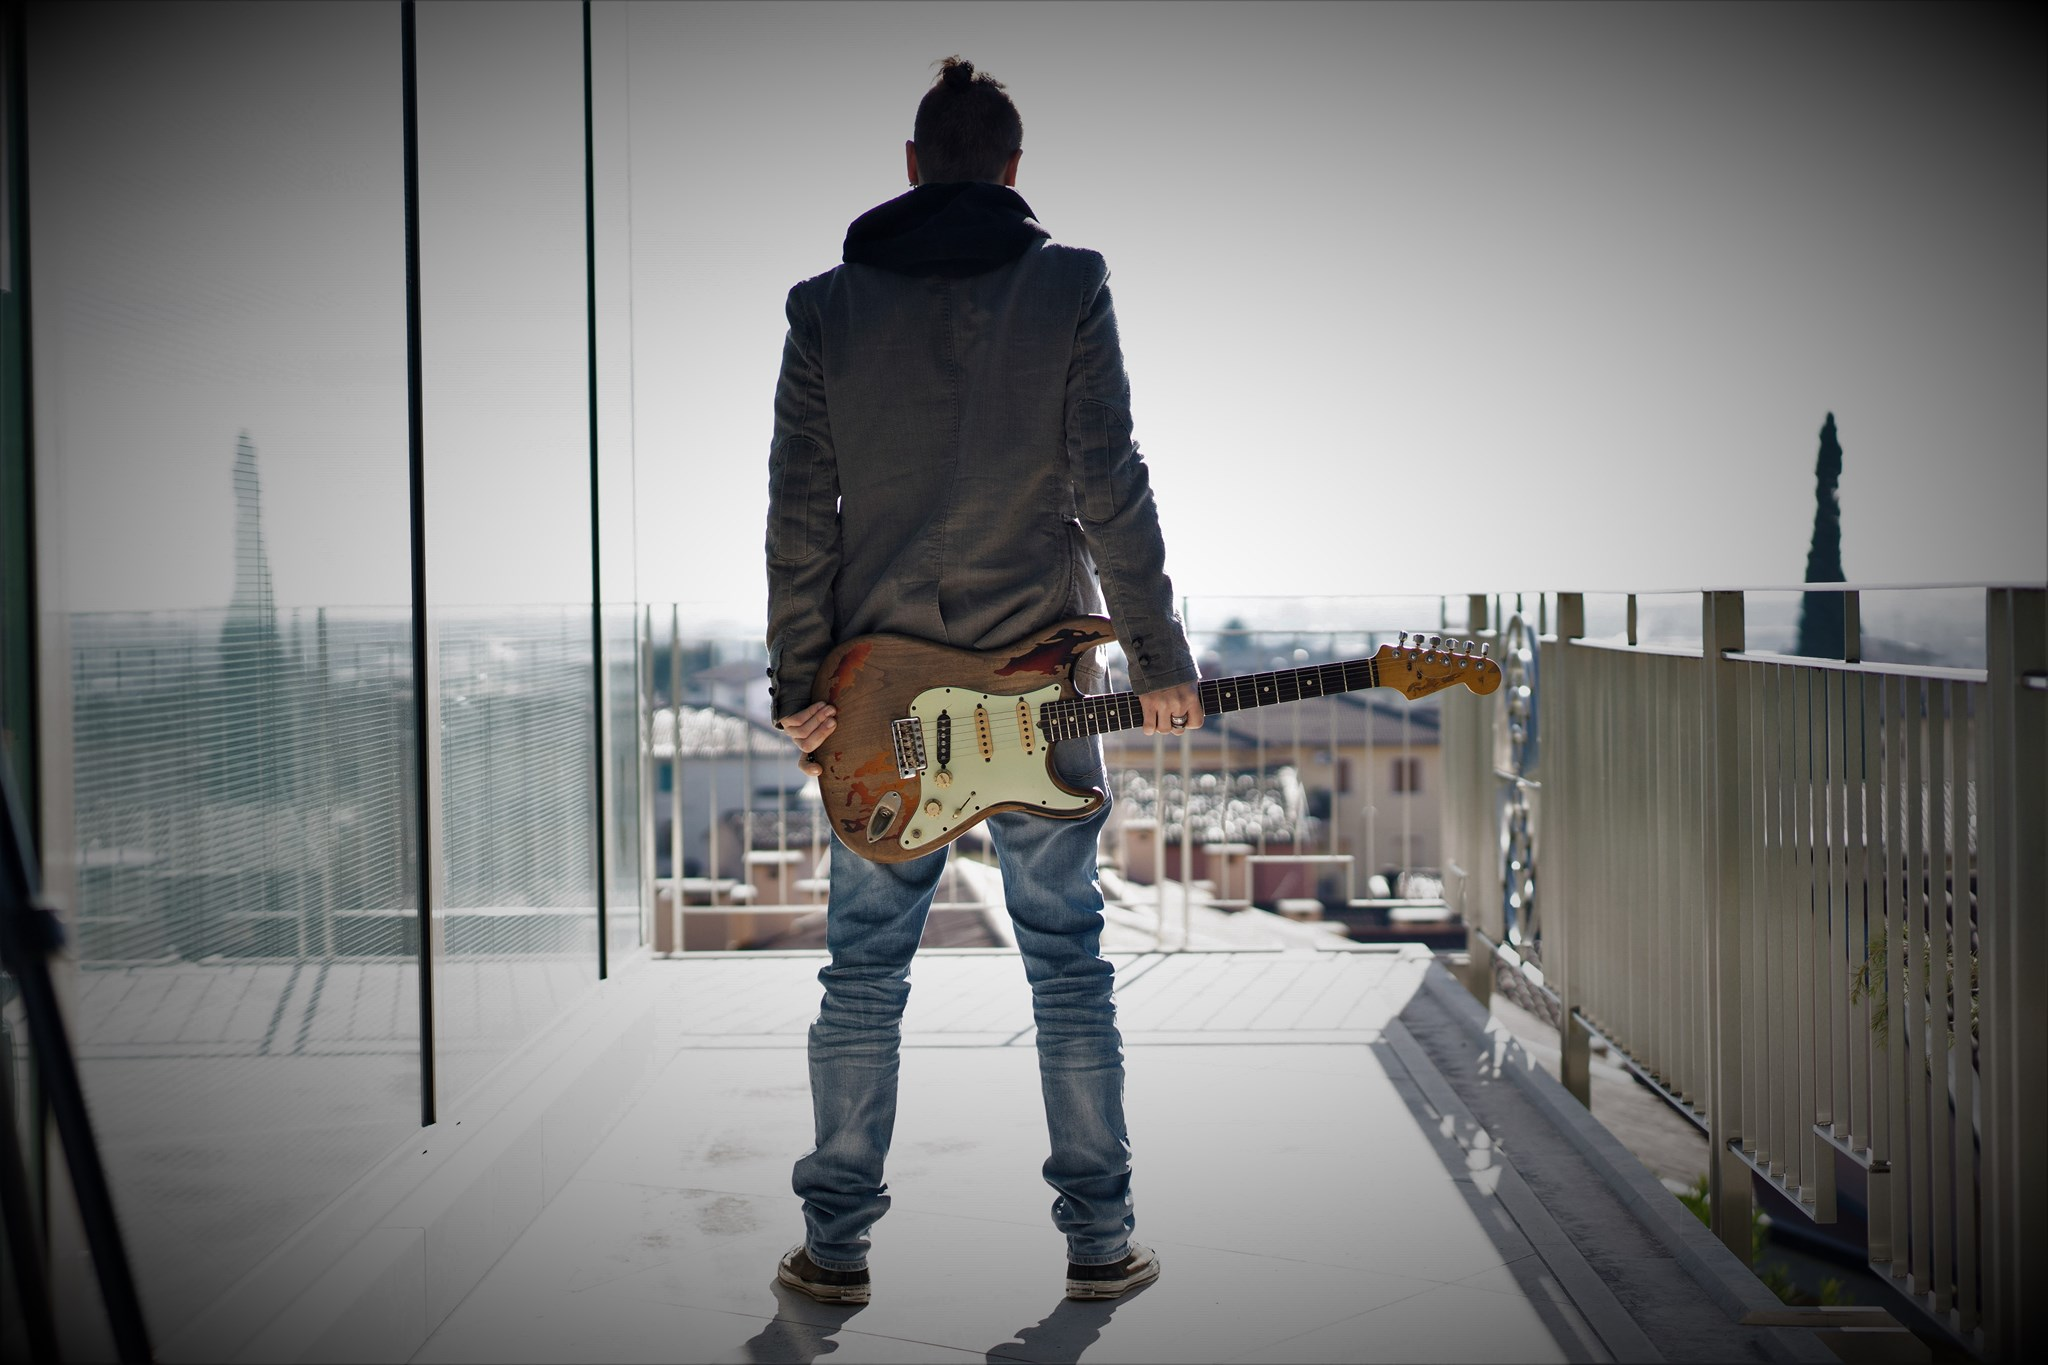 Pietro Cuppone è insegnante di chitarra acustica ed elettrica a School of Art, scuola di musica a Verona e Provincia